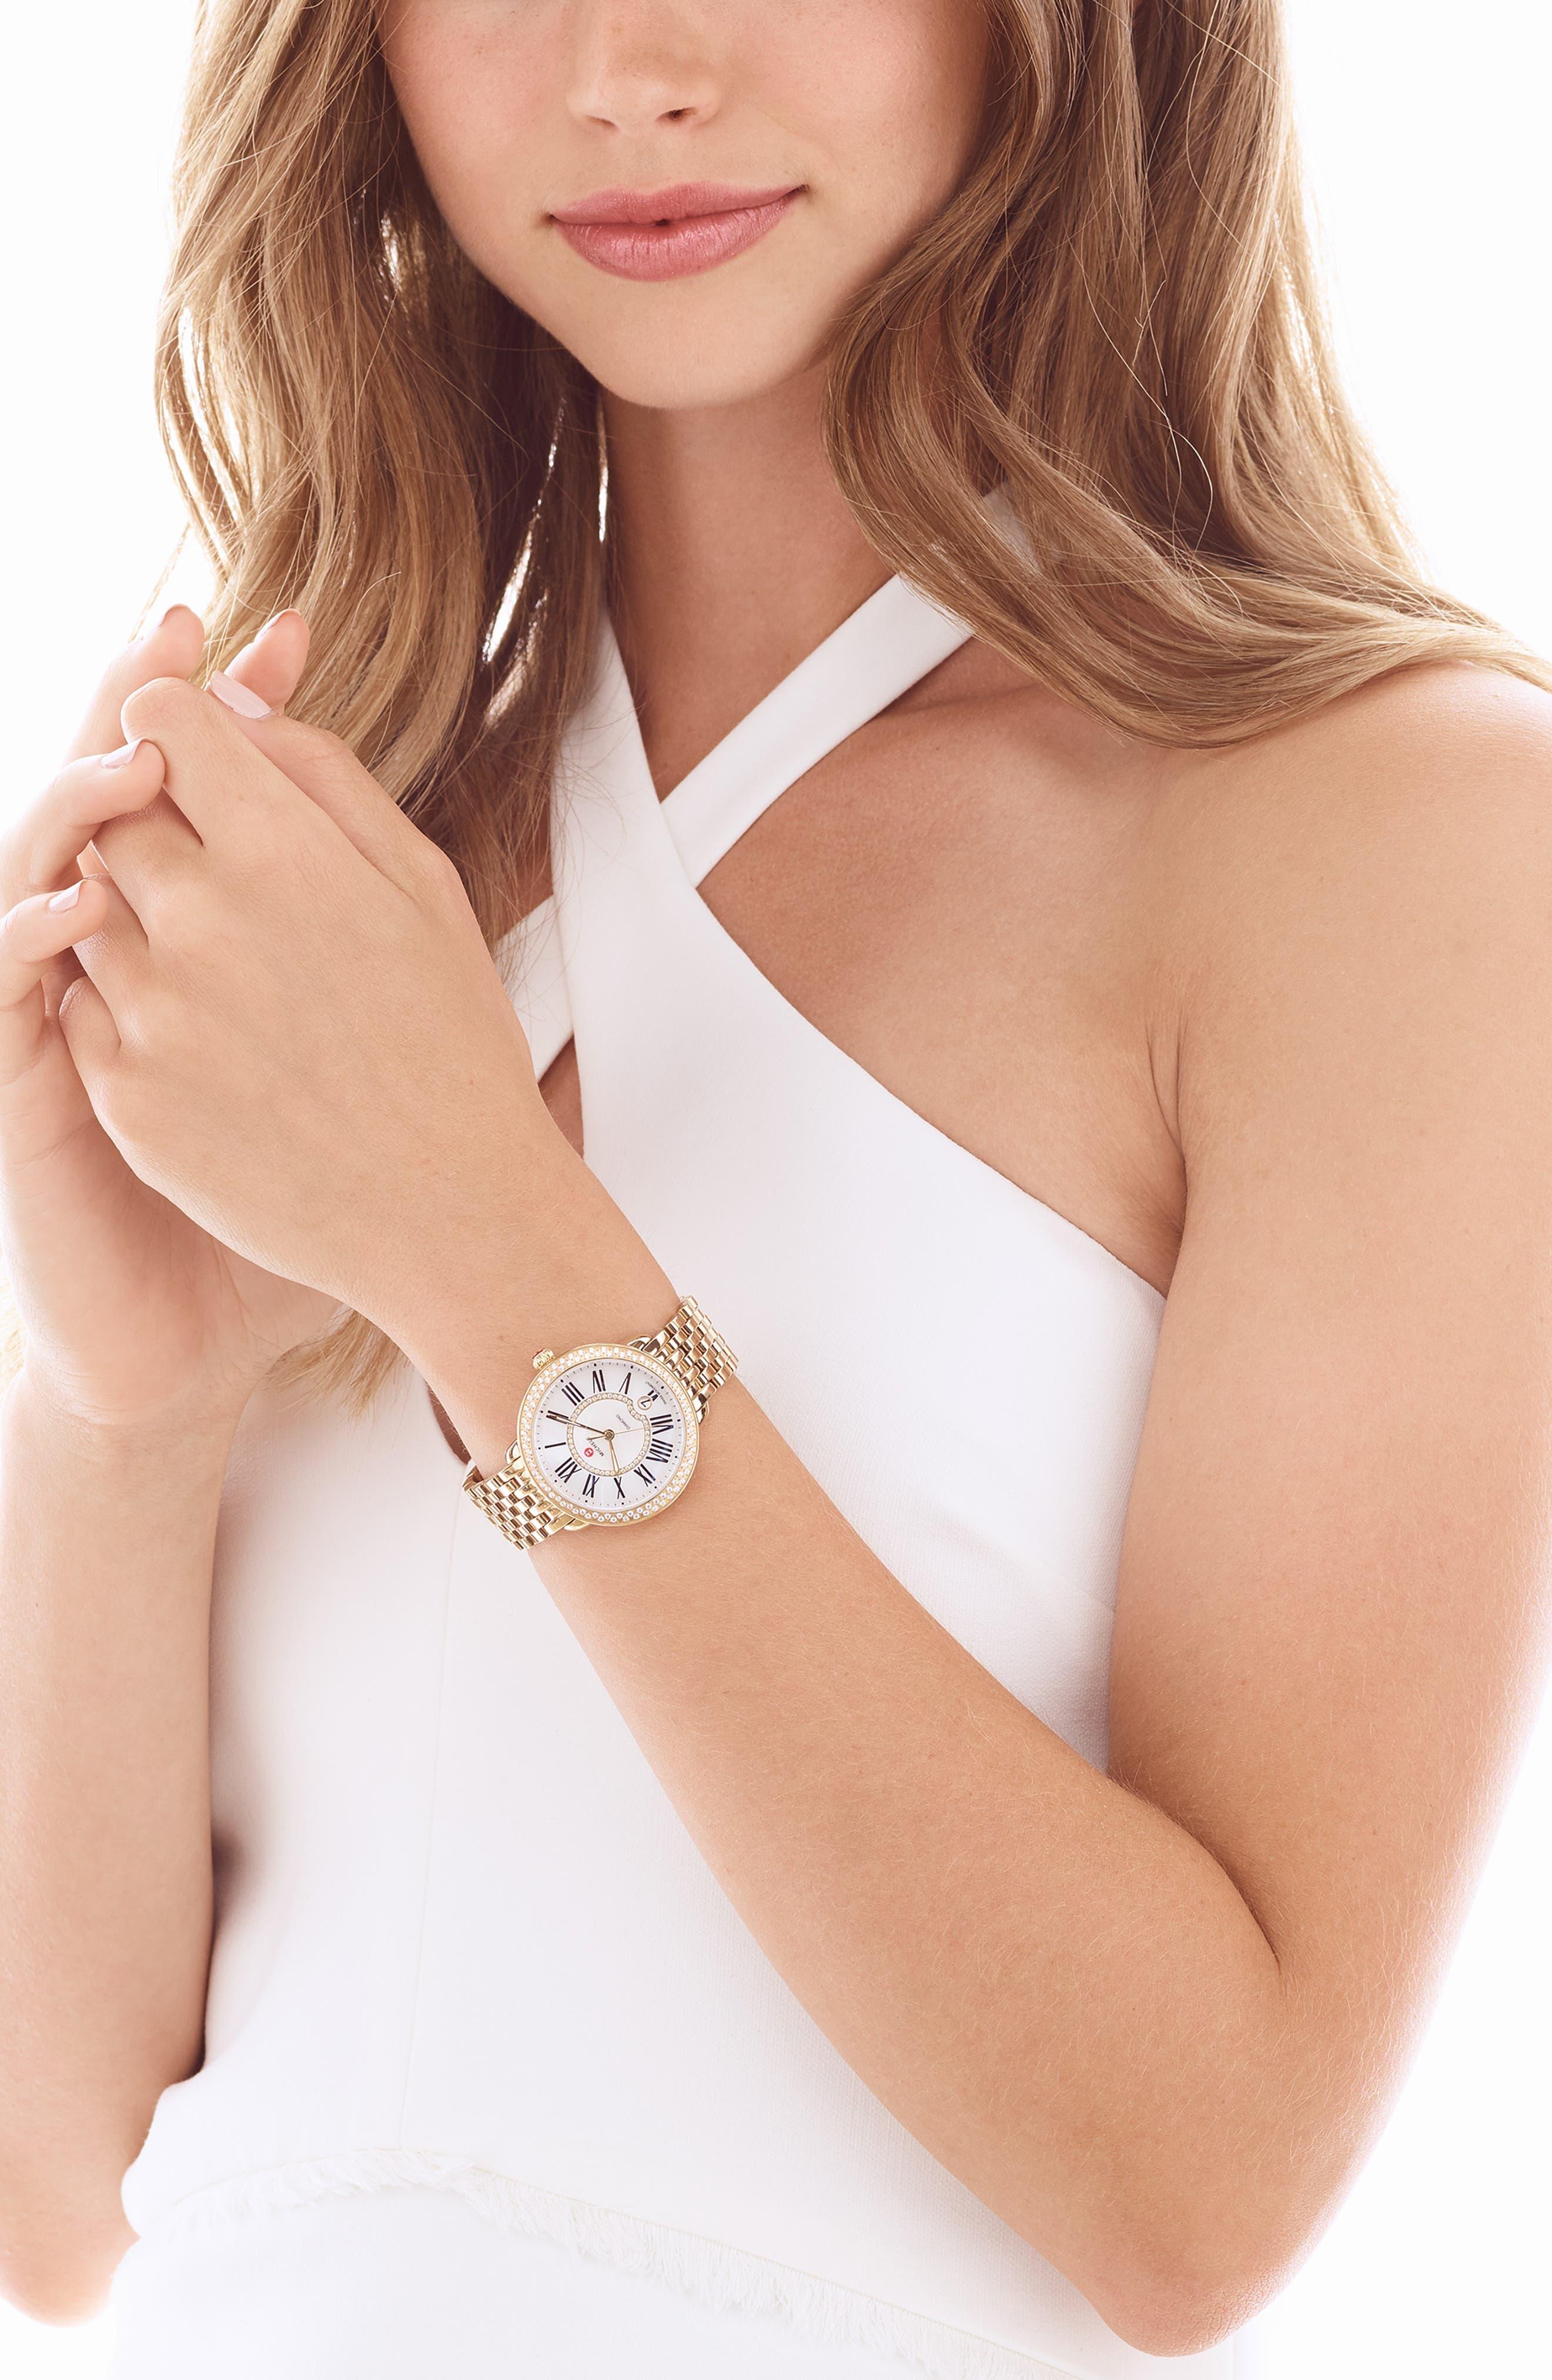 Serein 16mm Gold Plated Bracelet Watchband,                             Alternate thumbnail 4, color,                             Gold